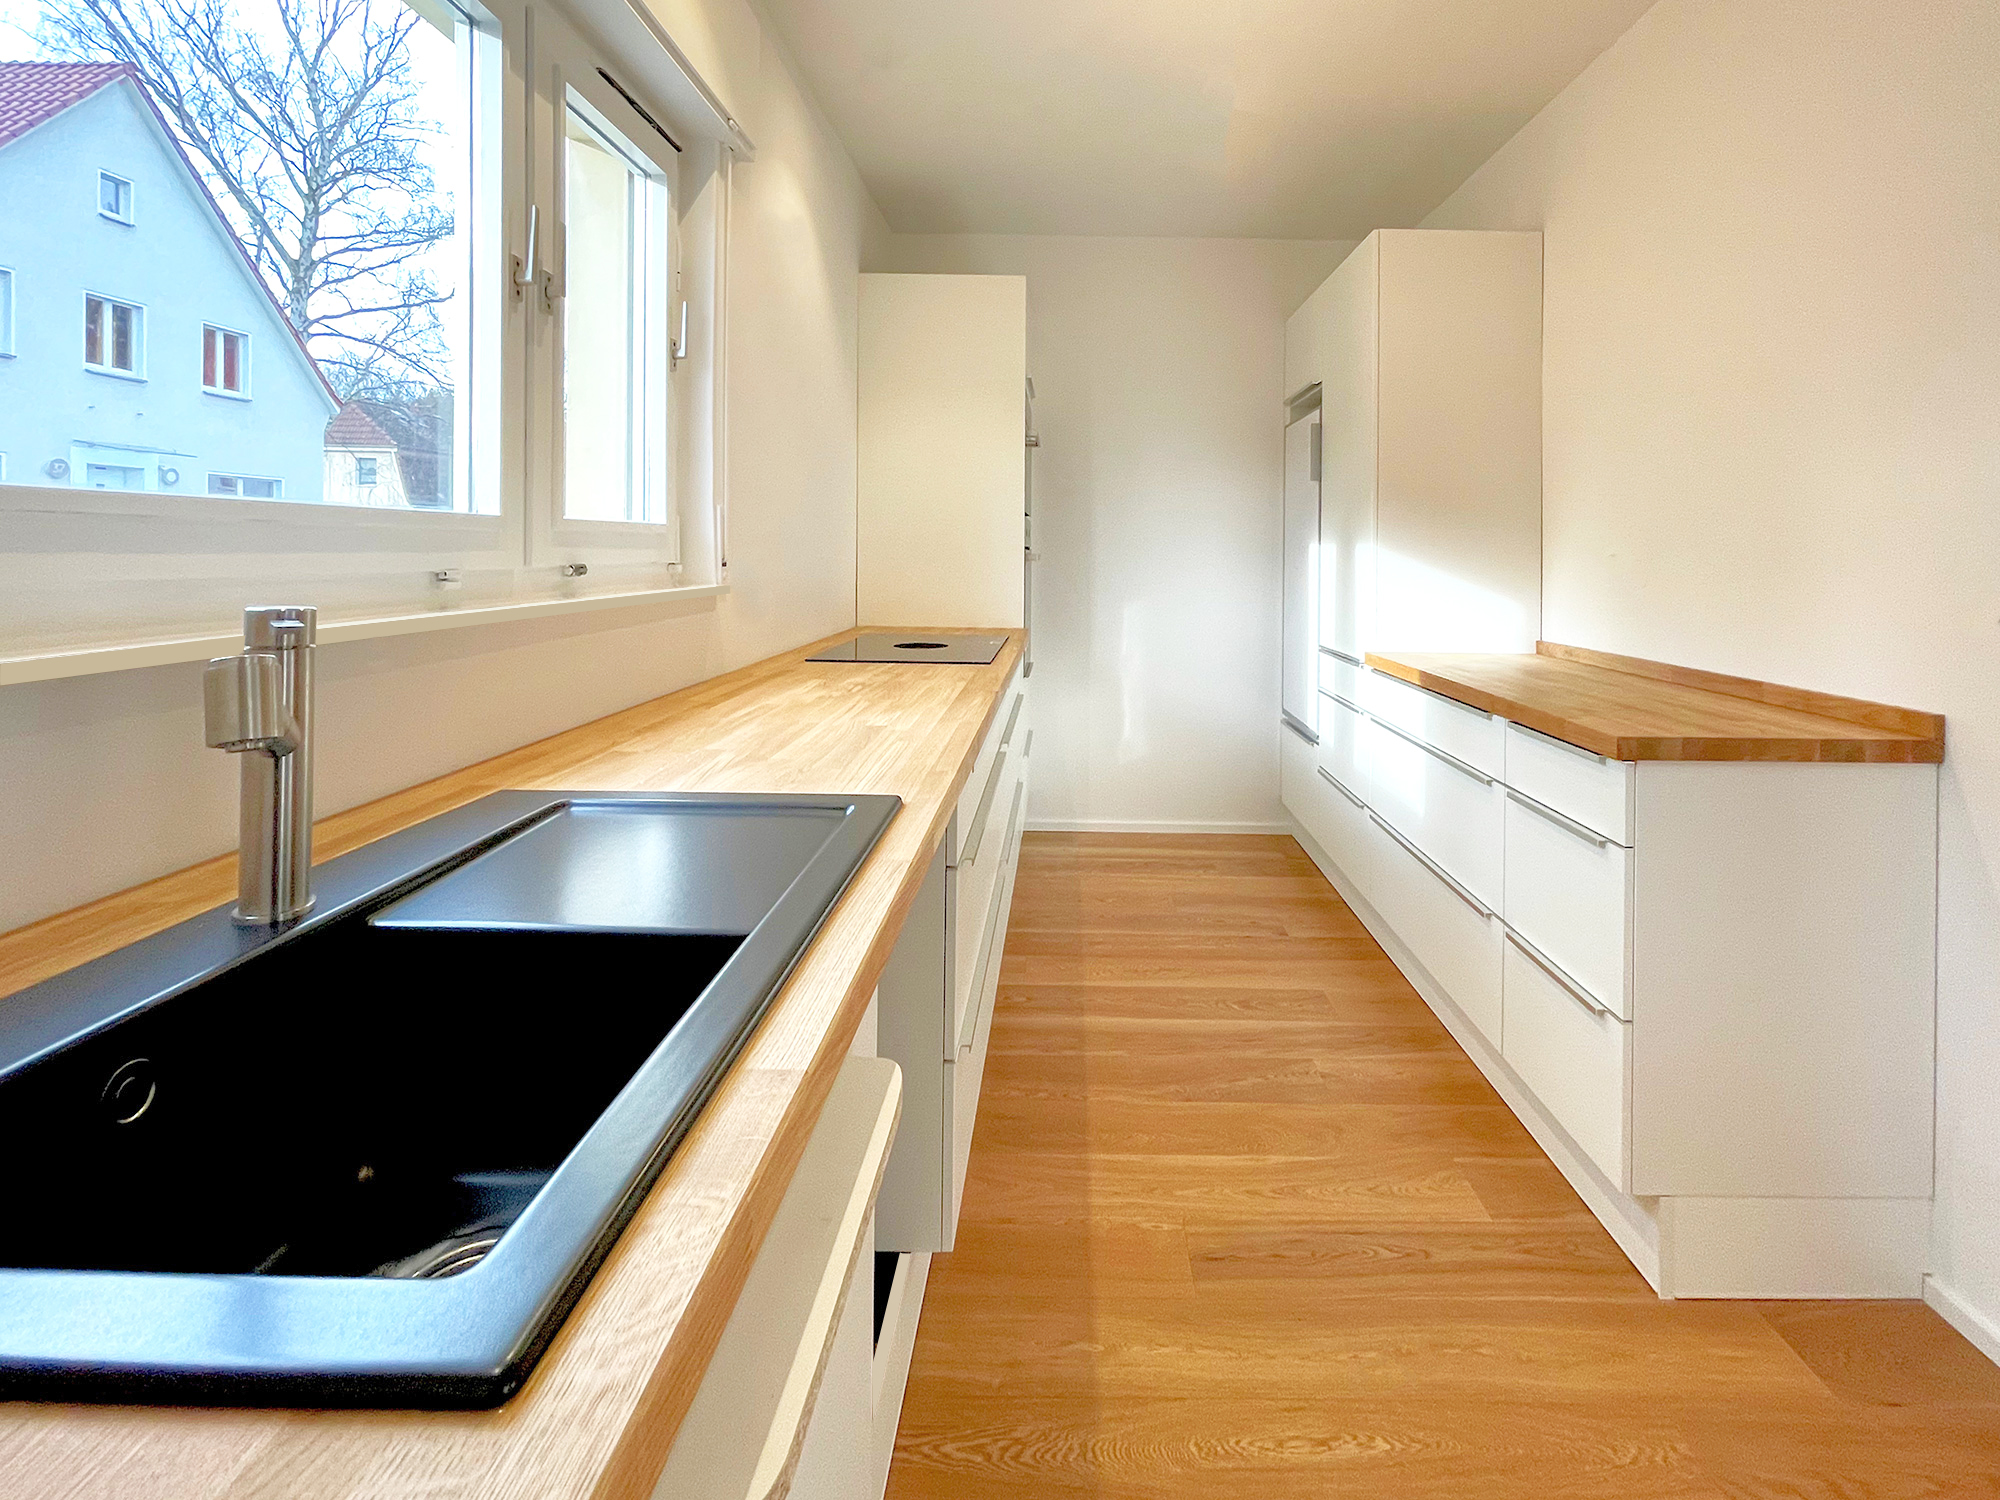 Fertigstellung Komplettsanierung 70er Jahre Haus in Berlin-Tegel